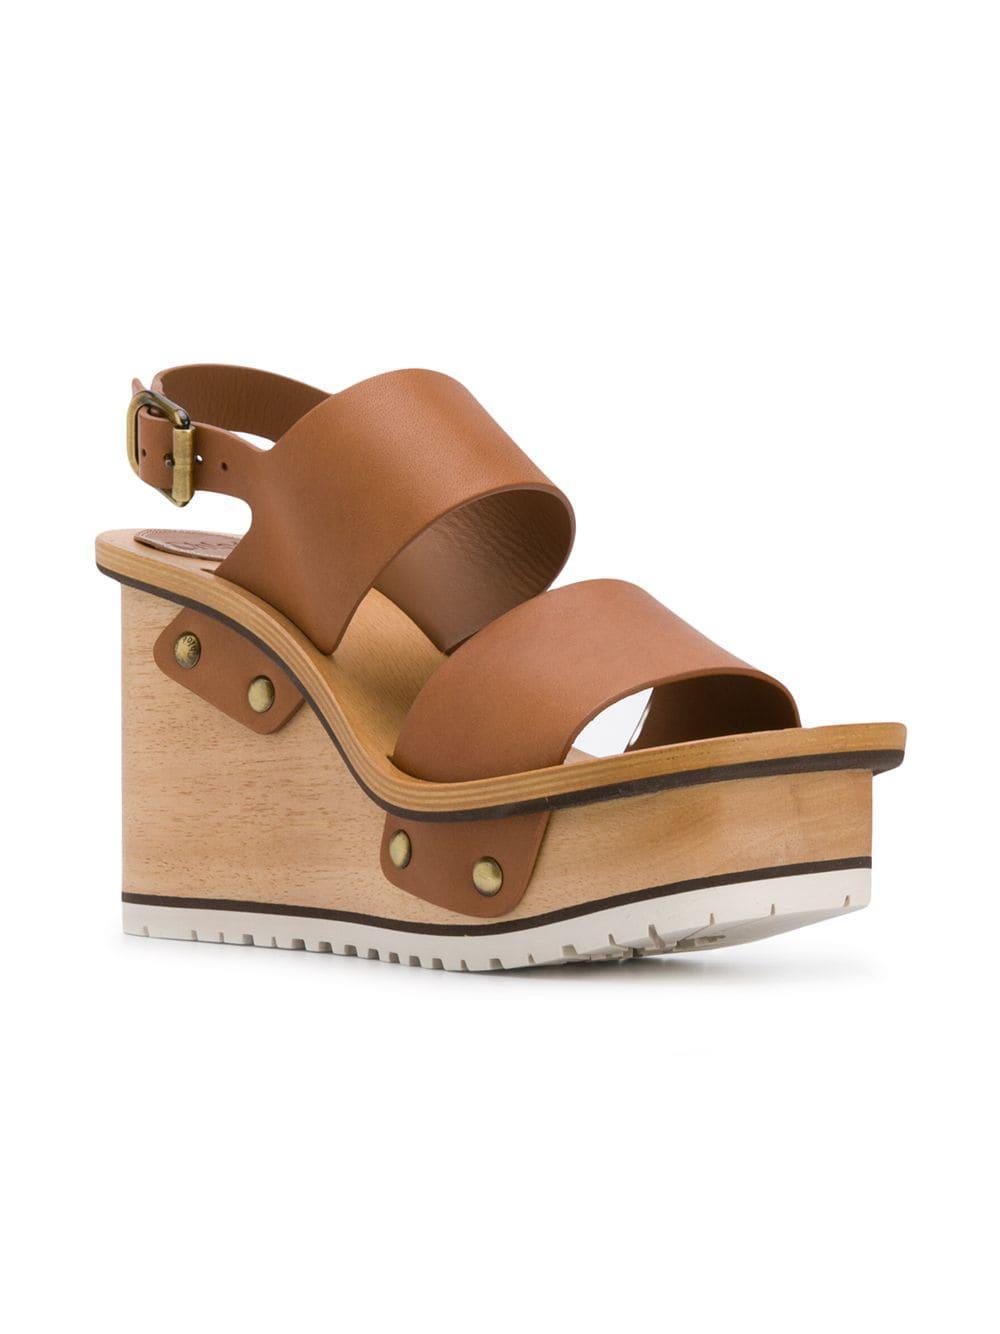 e76dd20c8783 Women s Brown Buckle Wedge Sandals